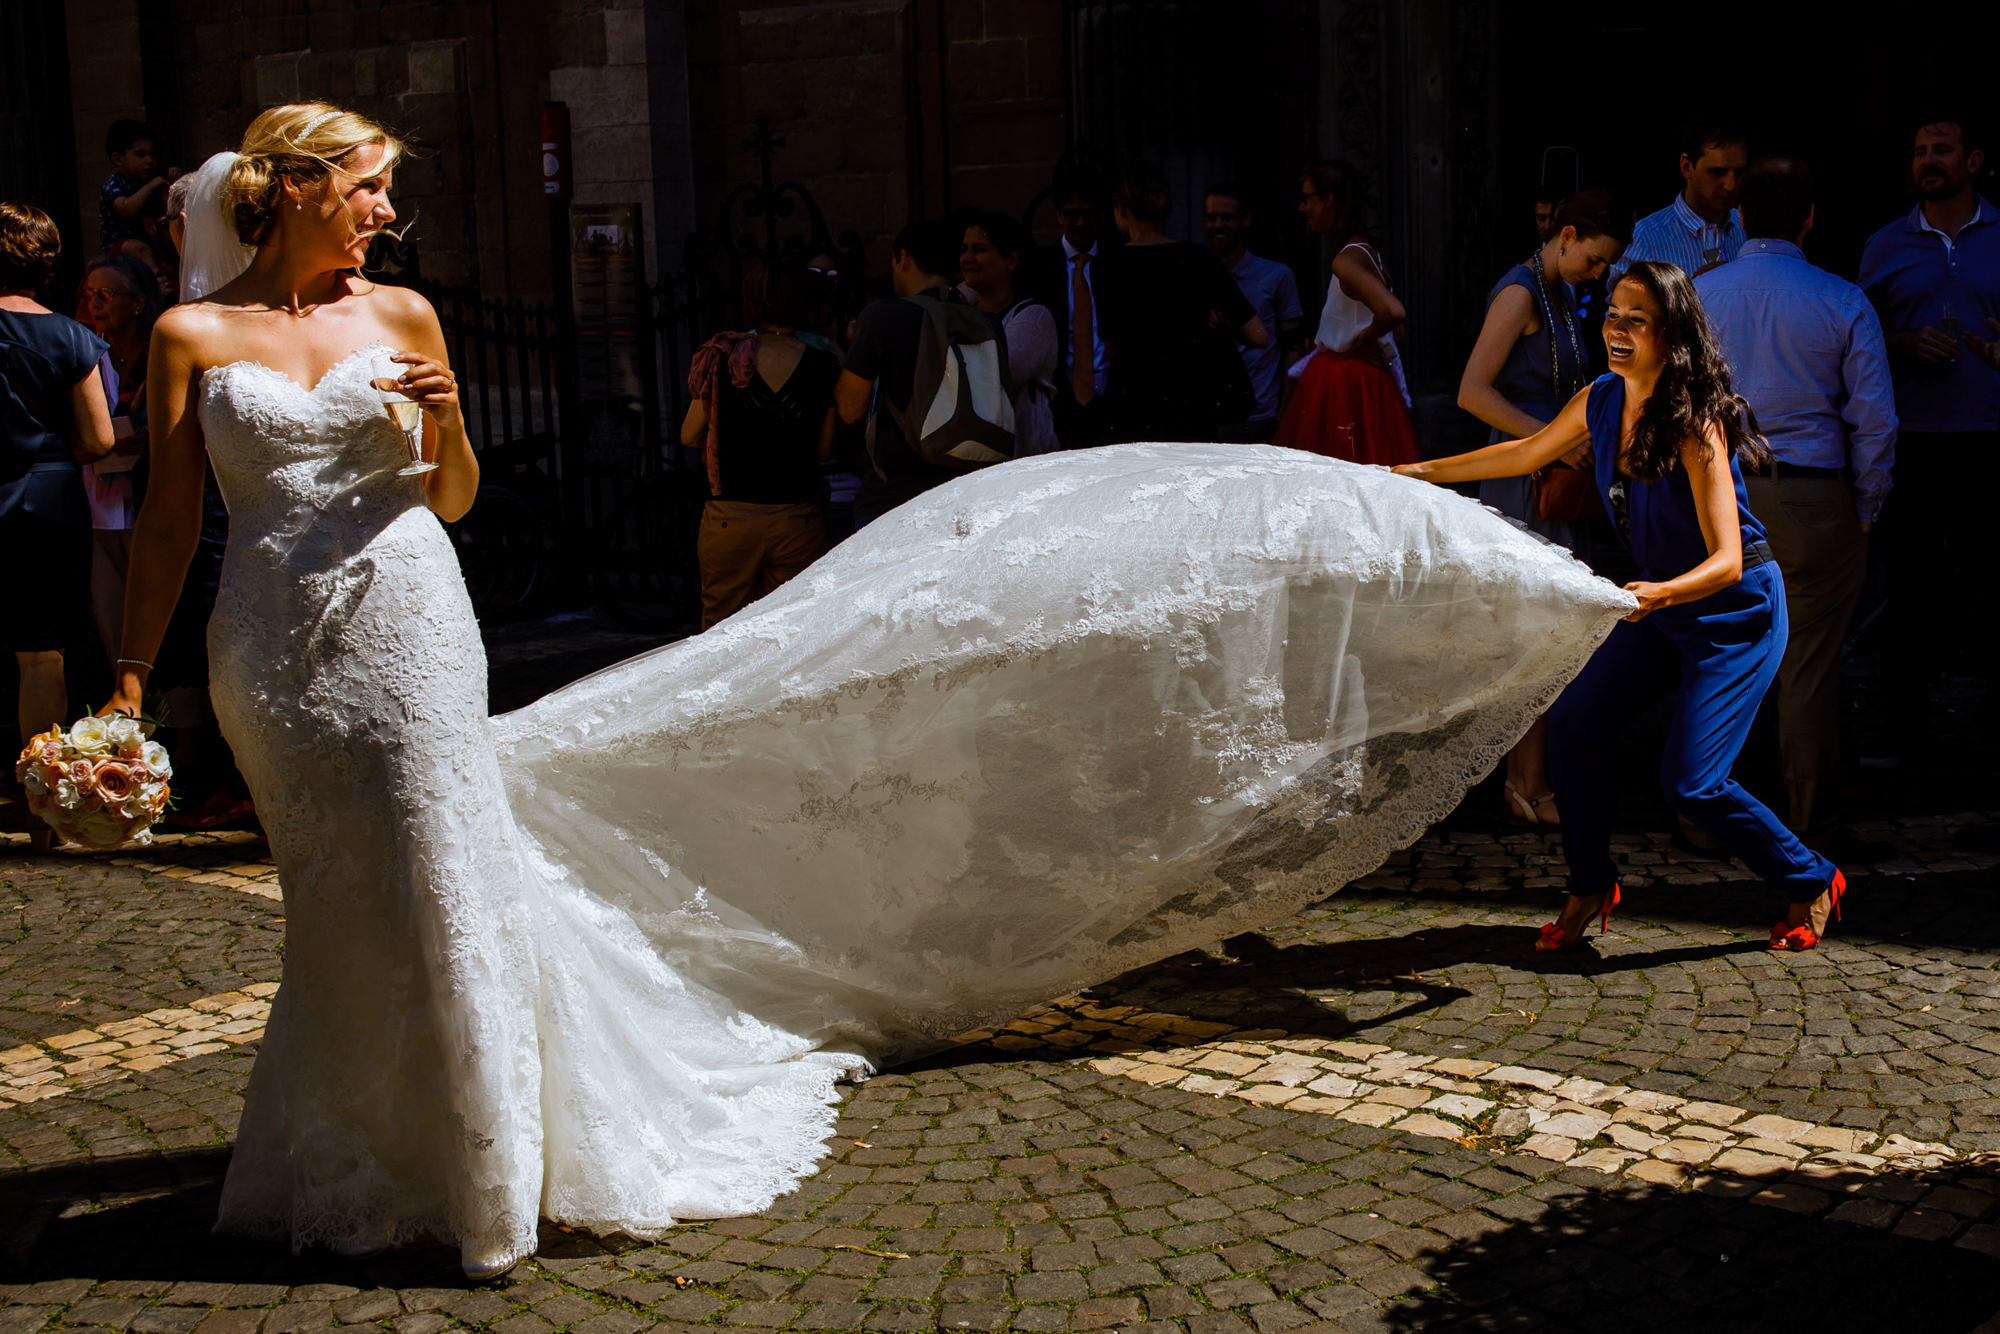 Guests helps bride wiht runaway train - photo by Phillipe Swiggers